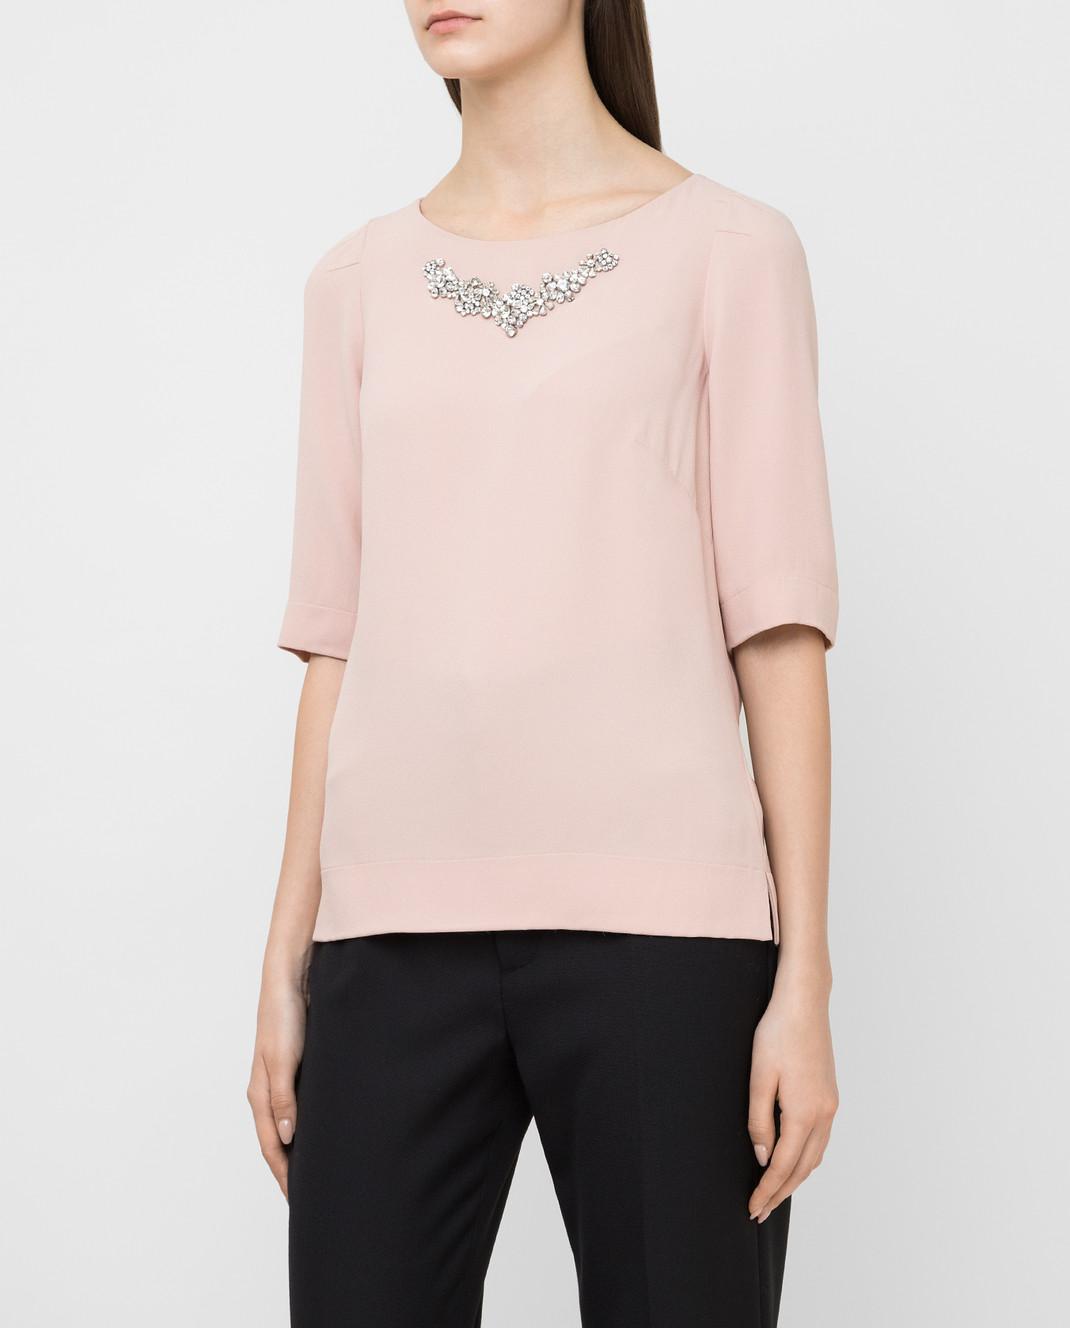 Jenny Packham Пудровая блуза с кристаллами WT104 изображение 3